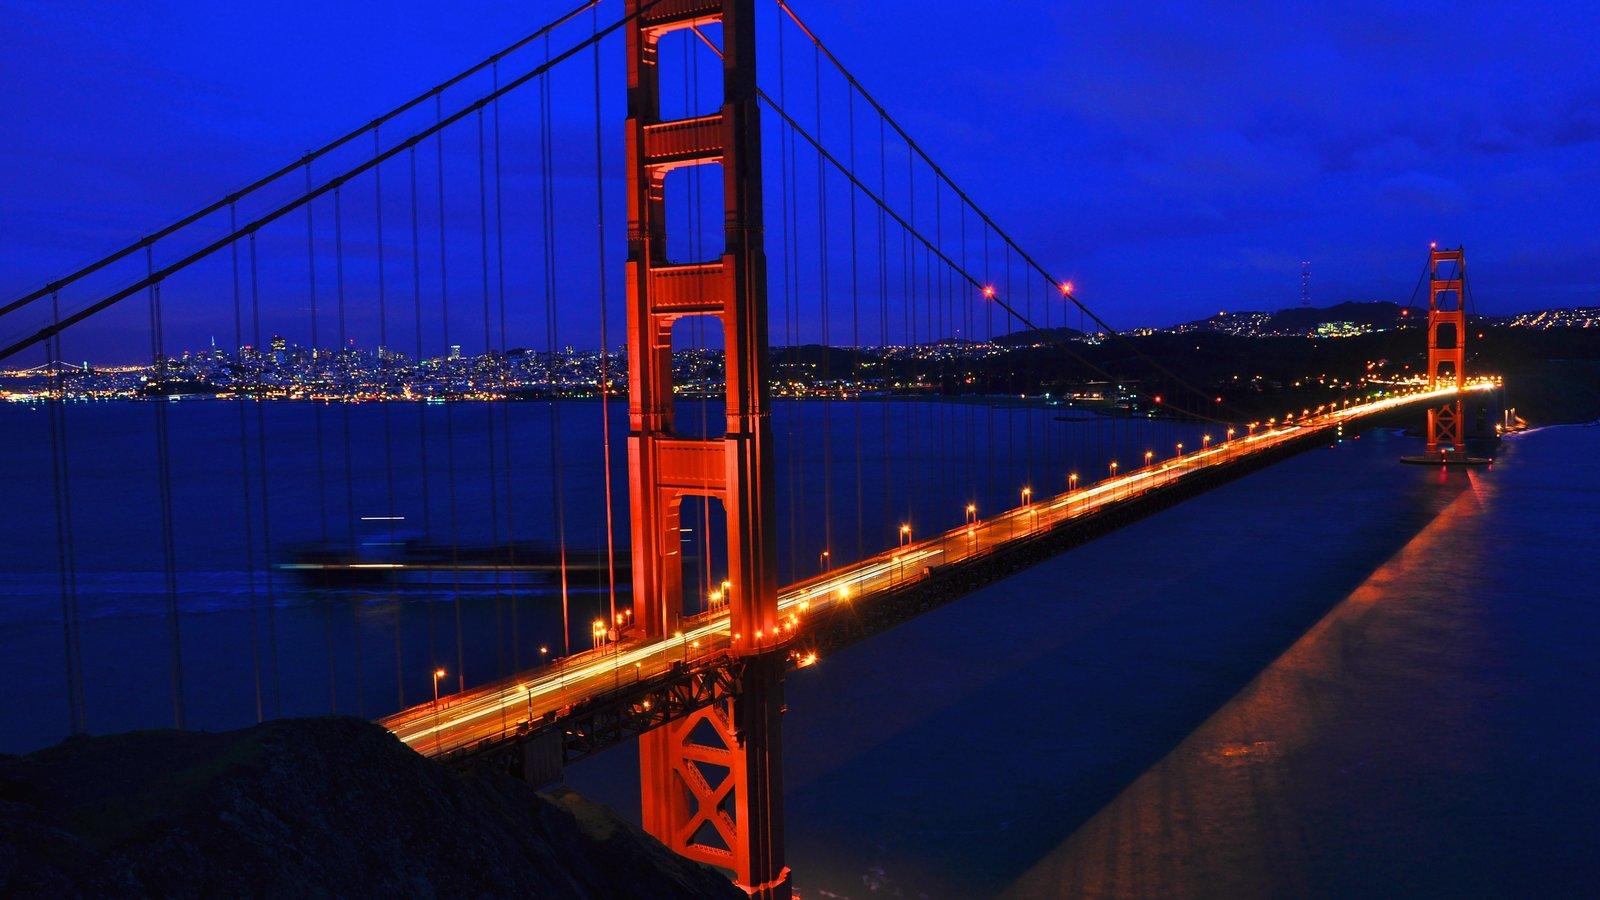 San Francisco showing general coastal views, night scenes and a city